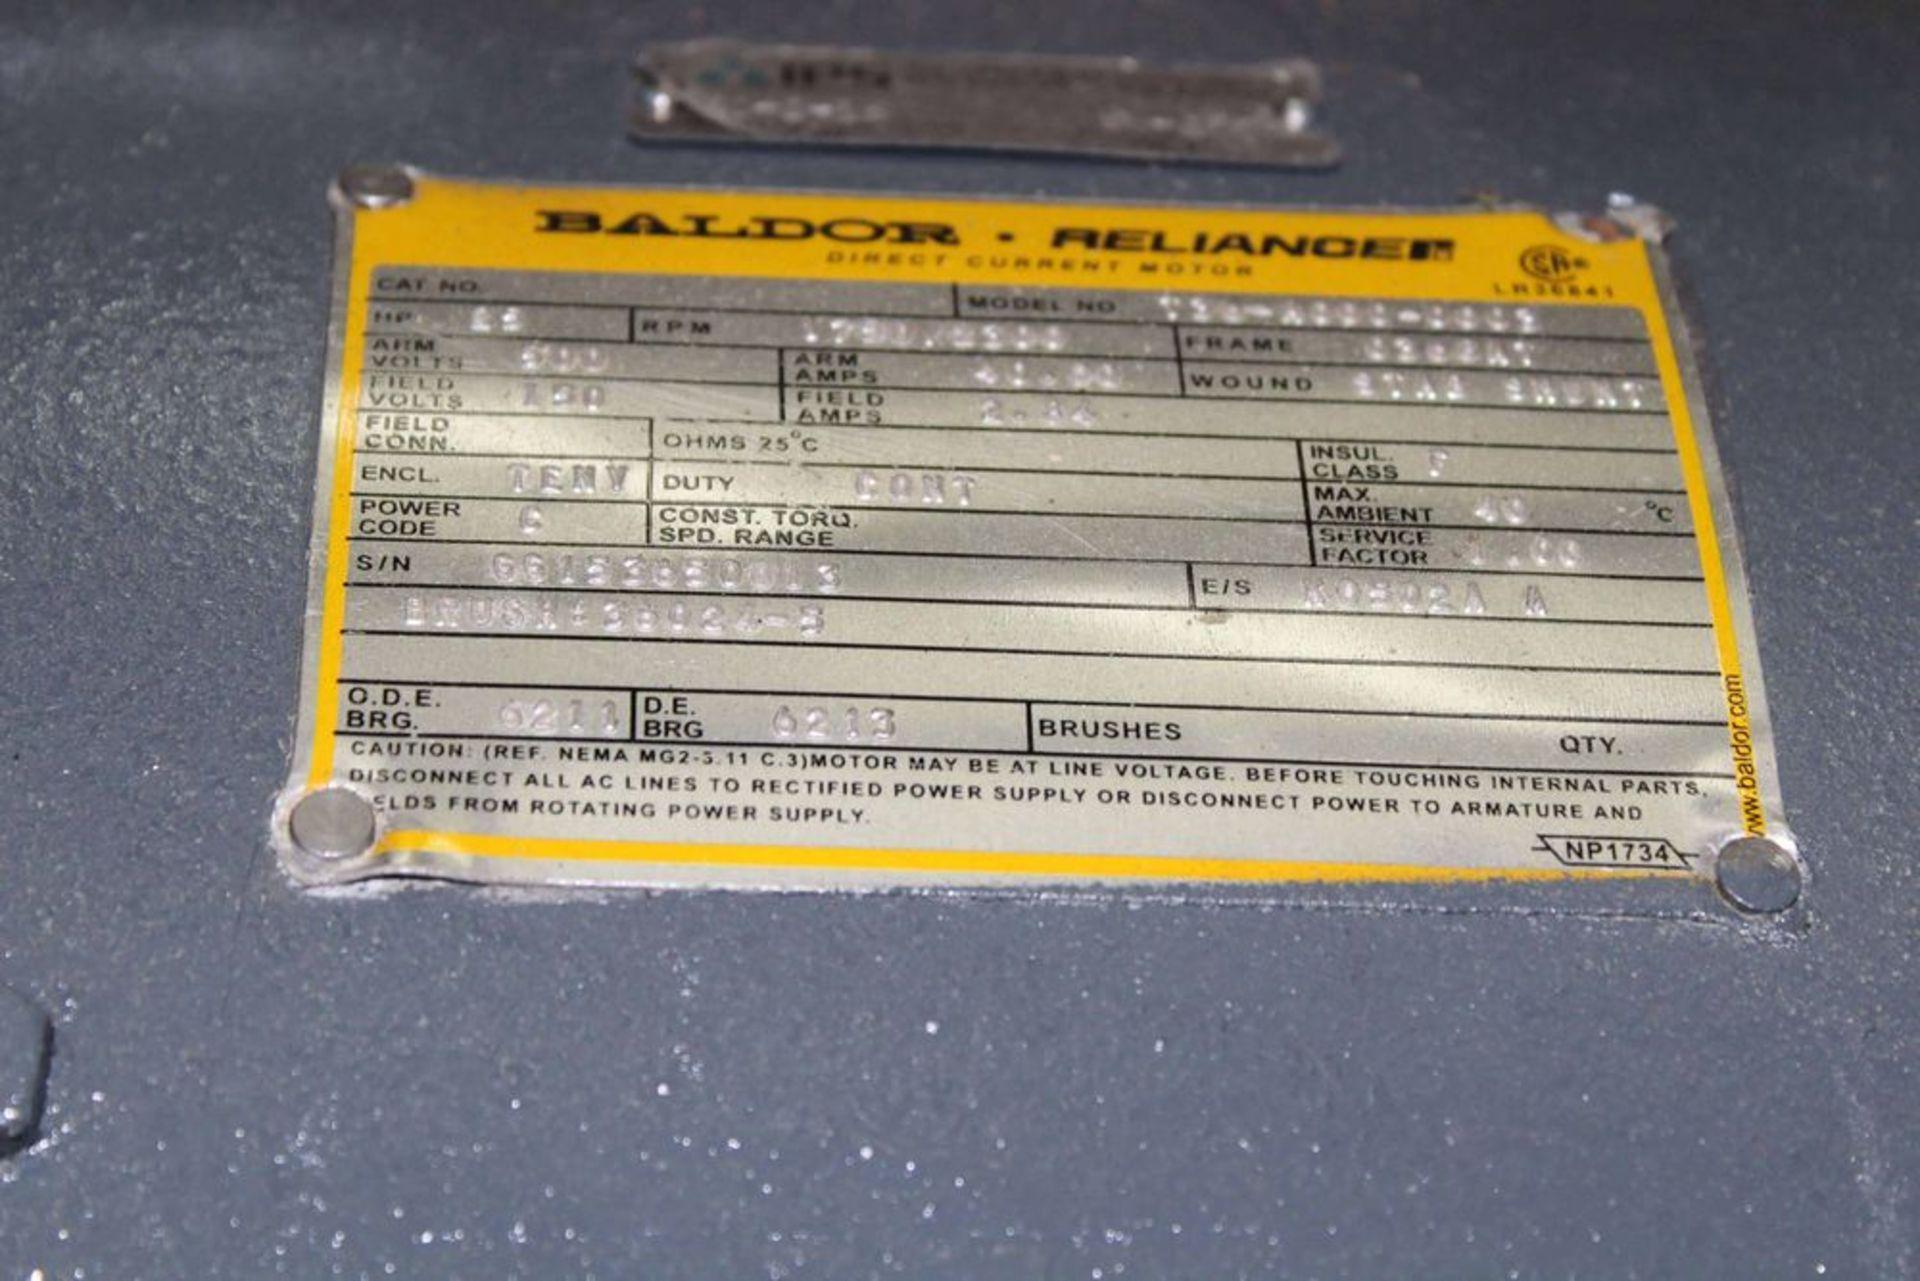 Los 727RB - Baldor Hydro Main Motor